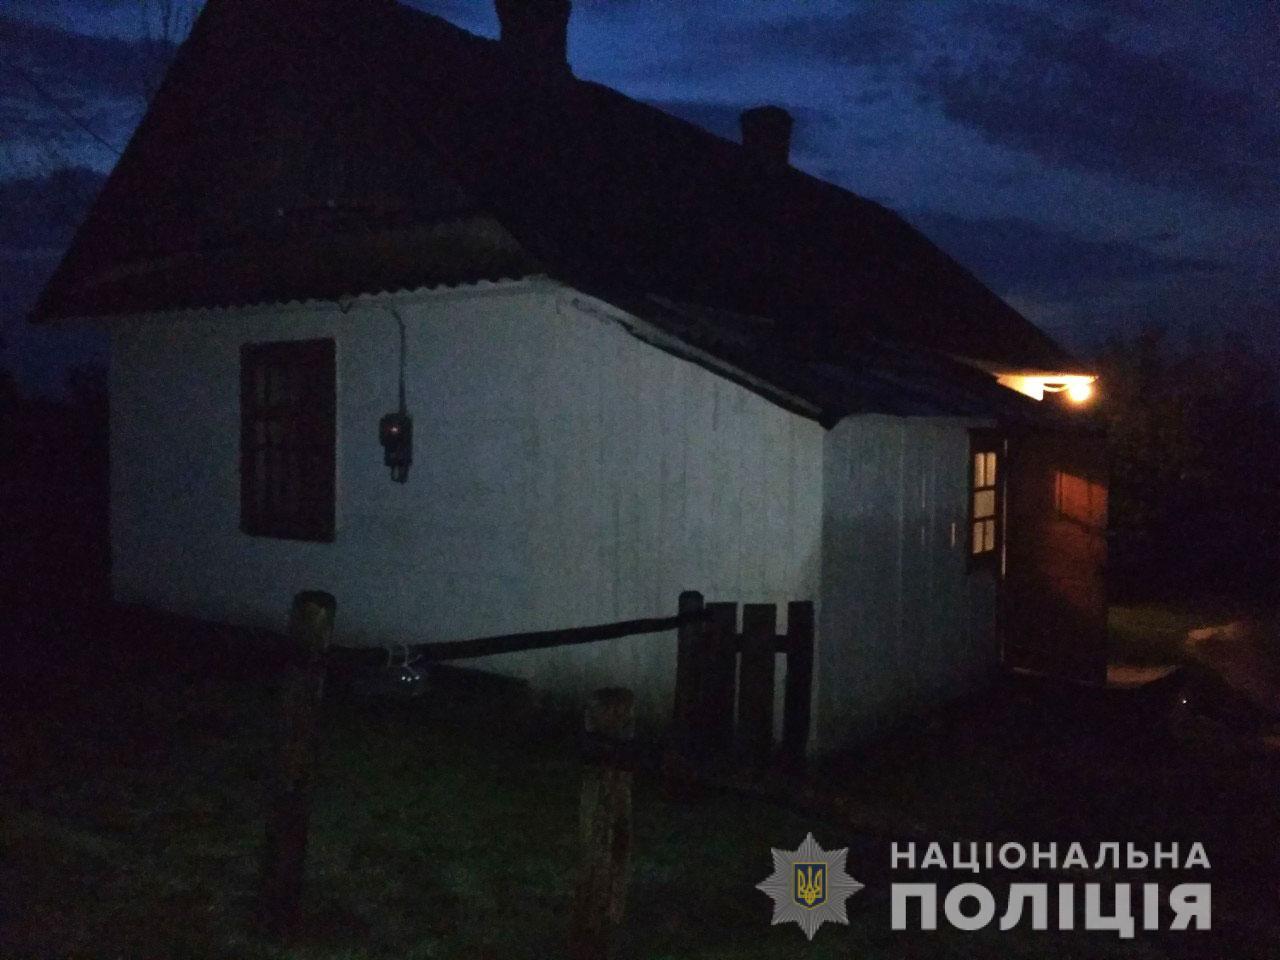 Смерть на Великдень: у Золотолині Костопільського району син убив матір